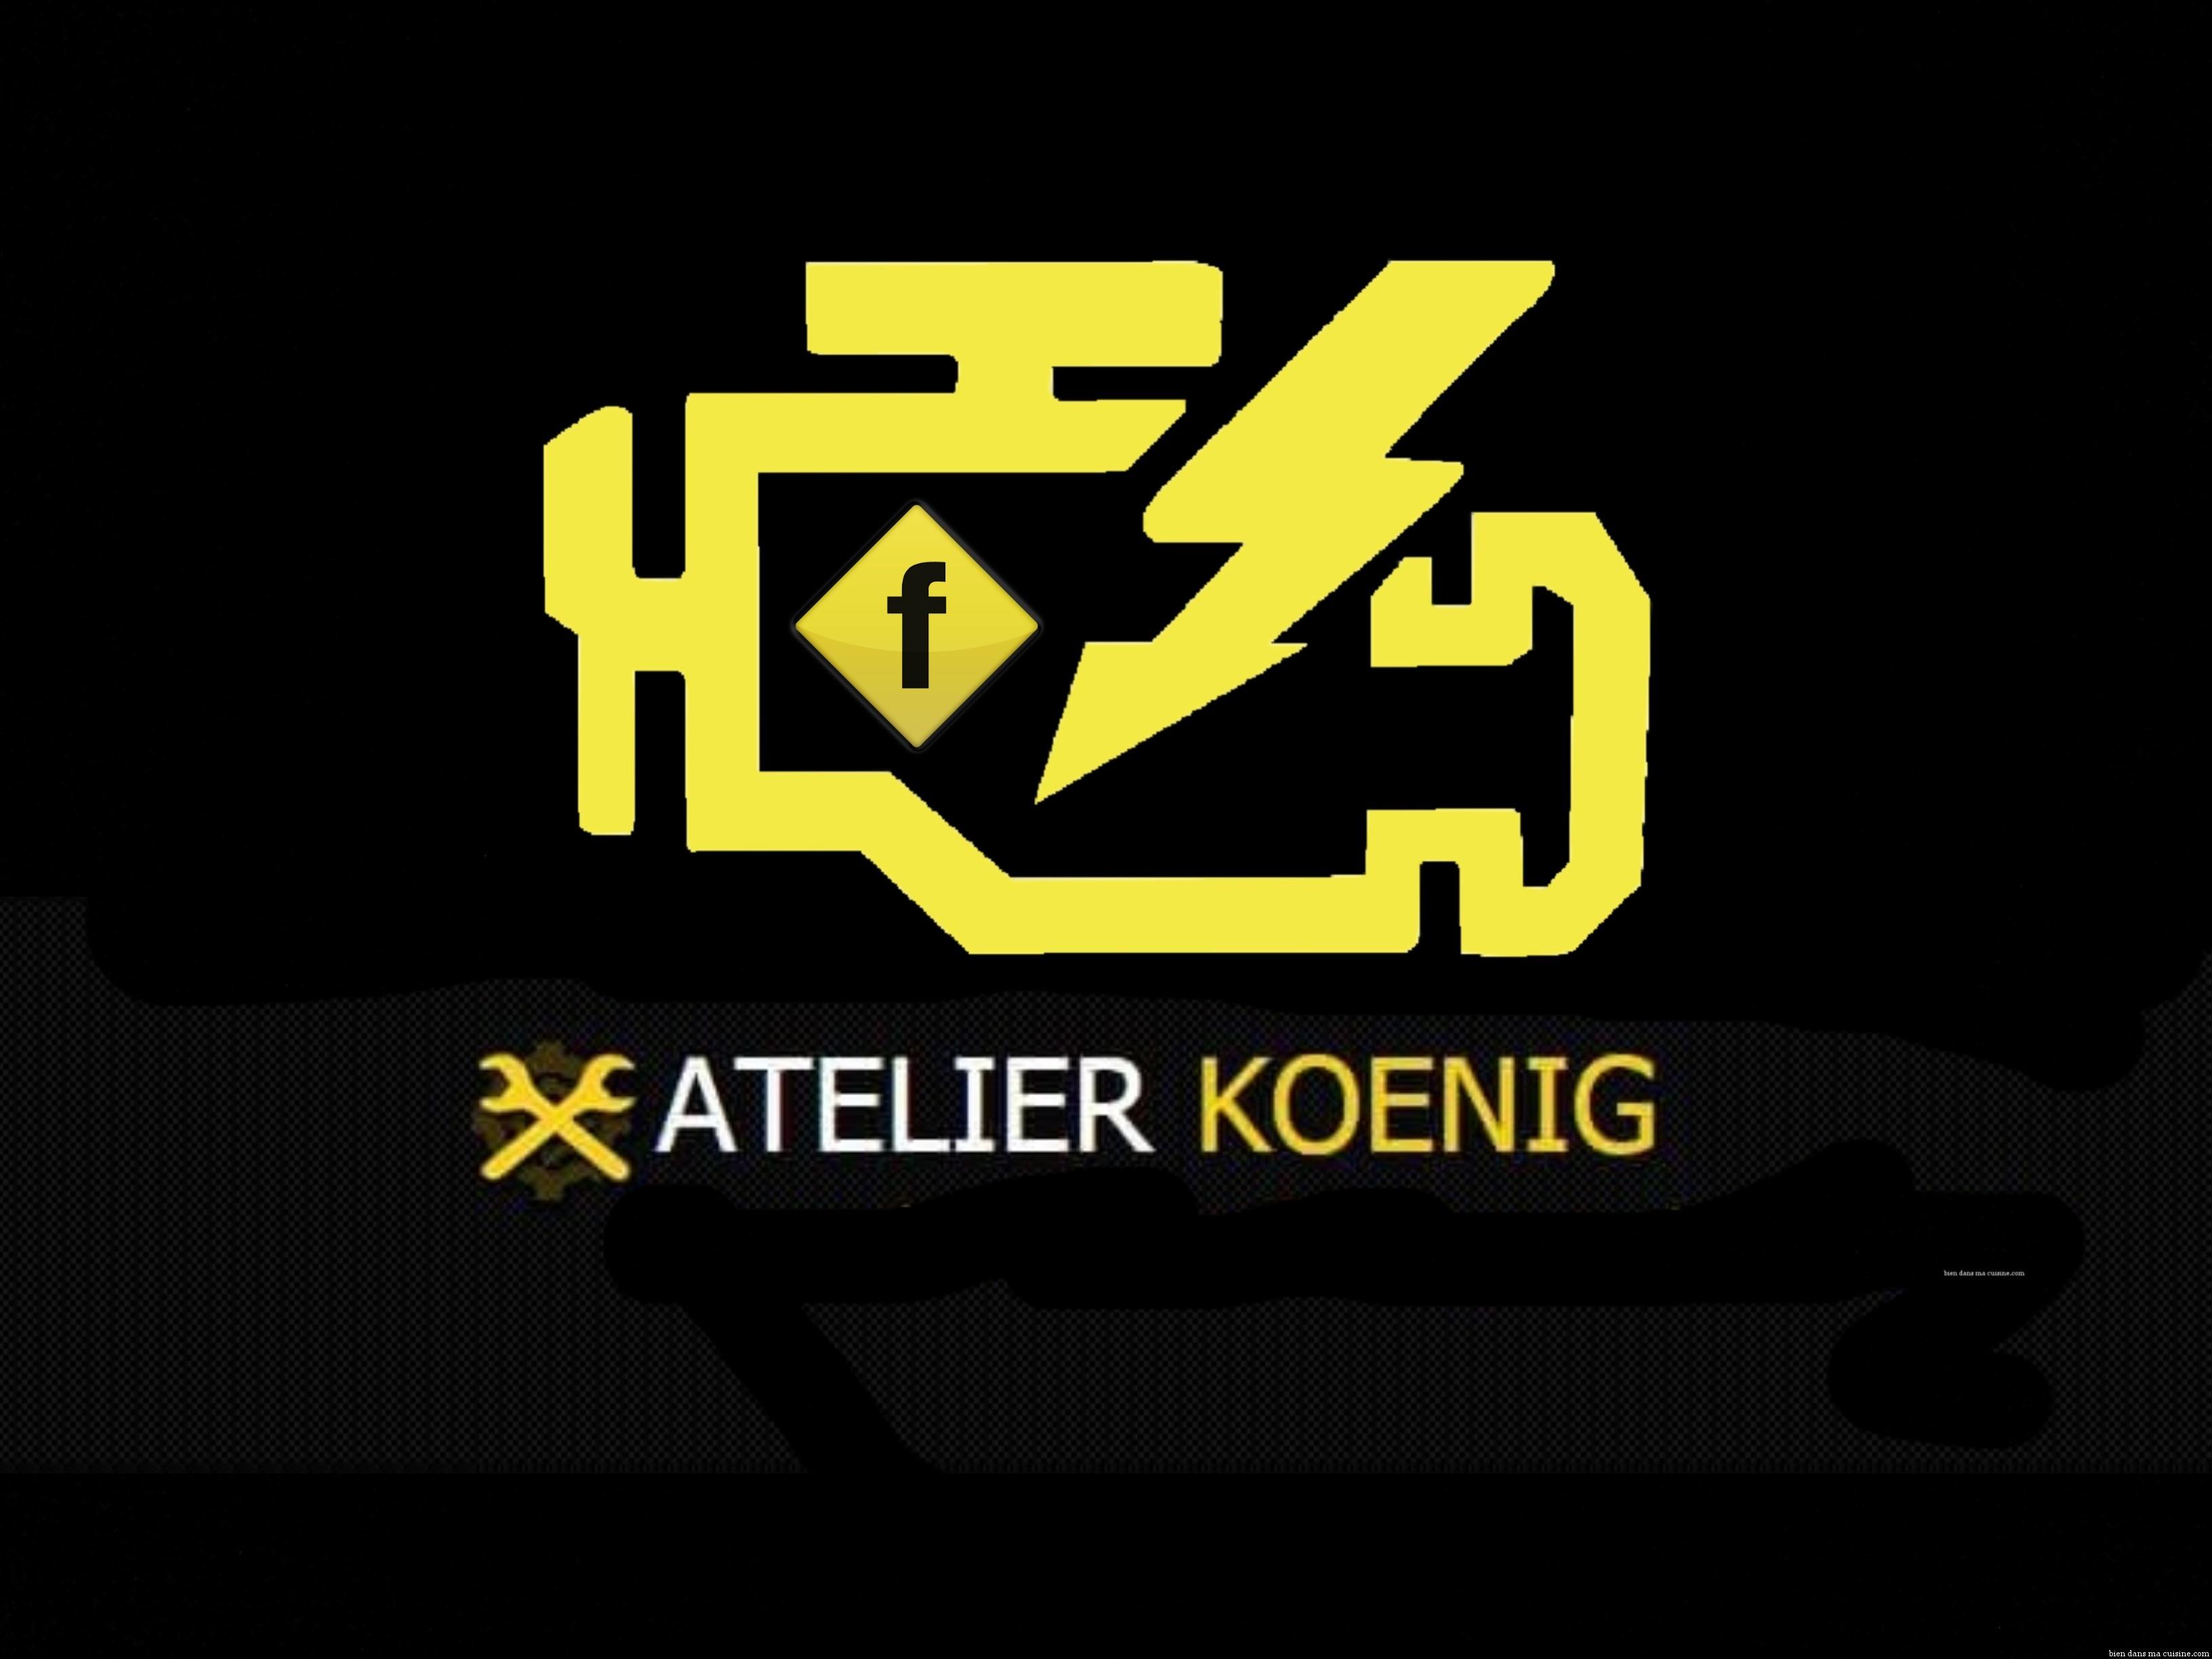 Atelier Koenig